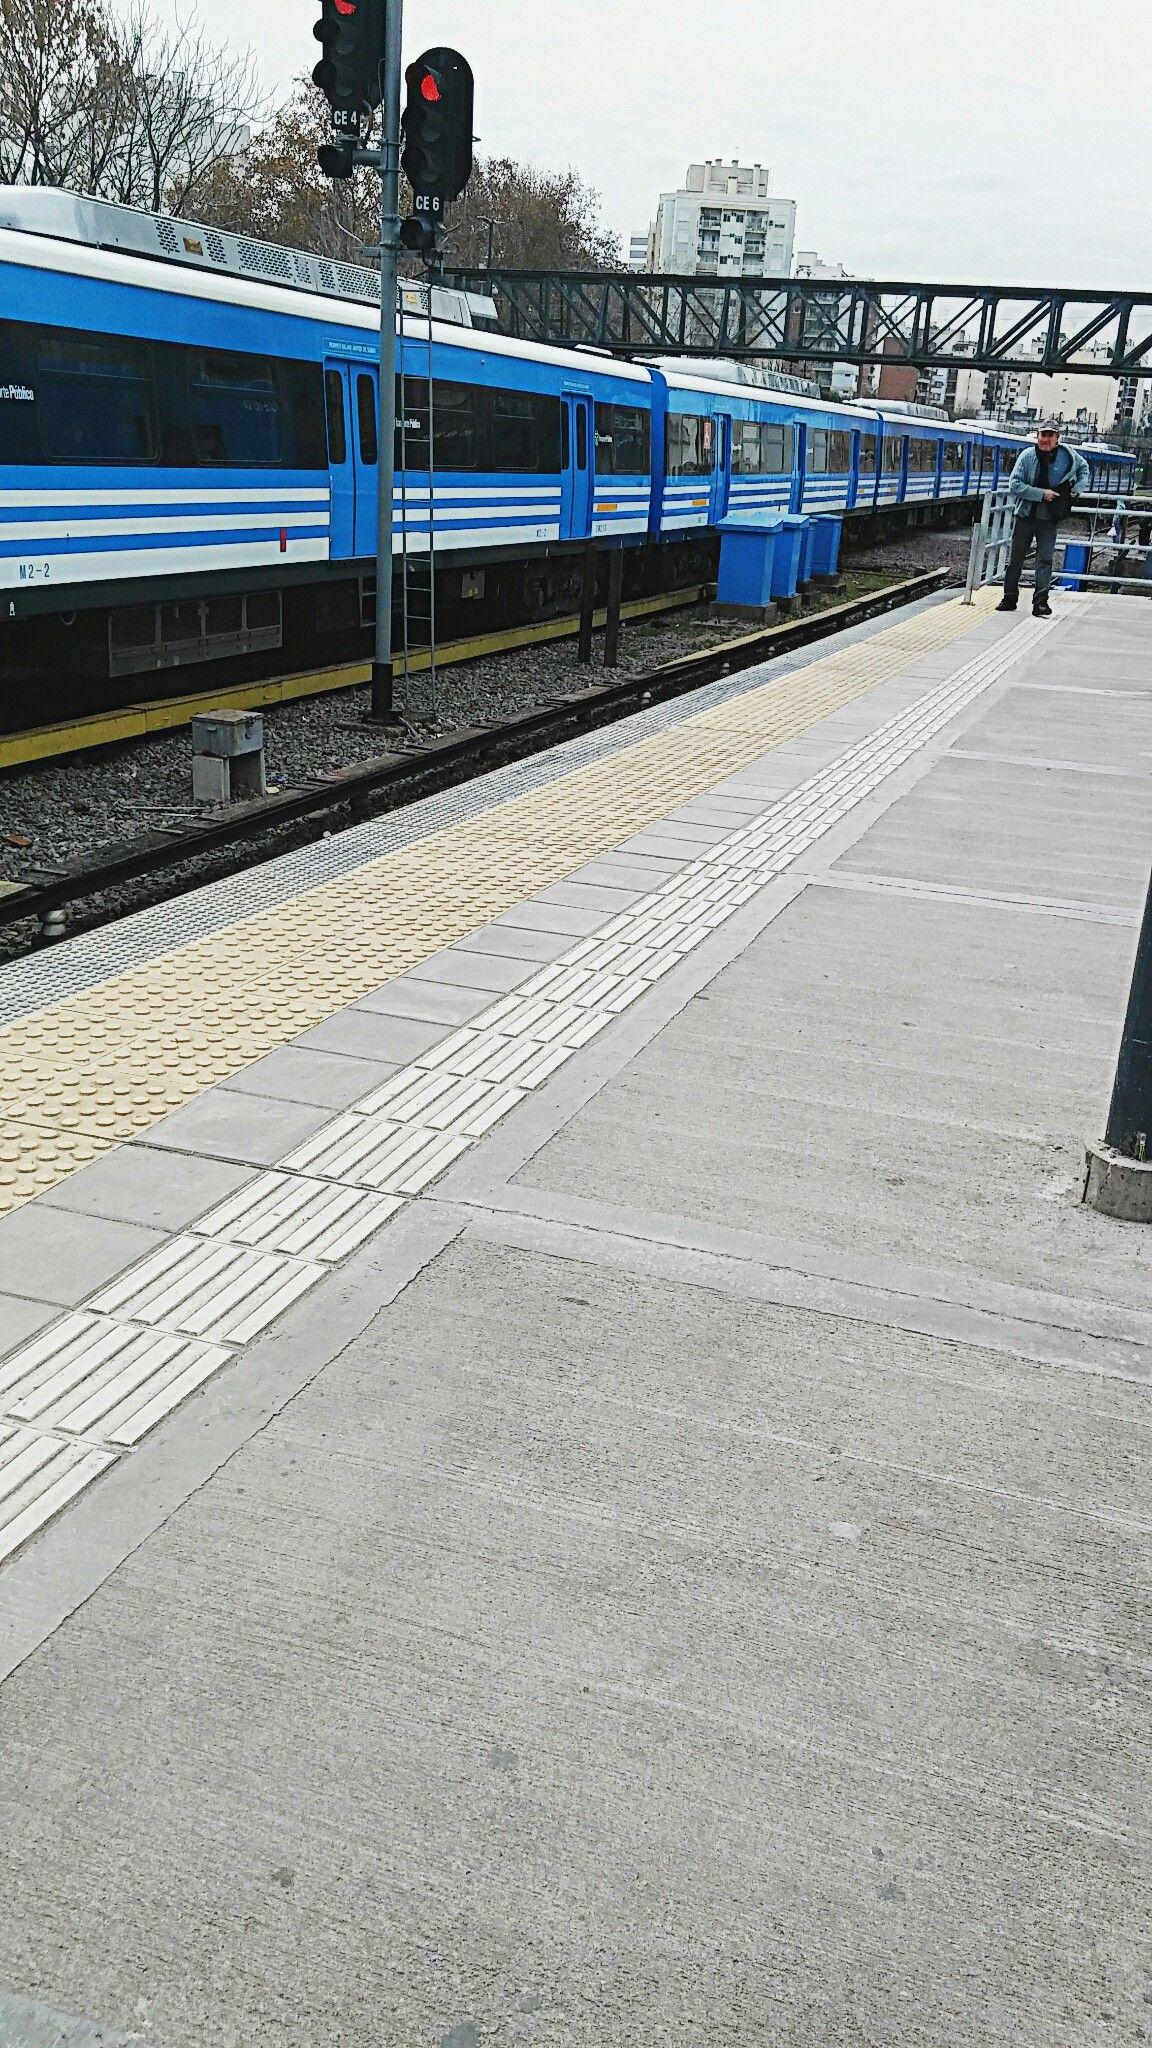 Tren Sarmiento partiendo de Caballito.